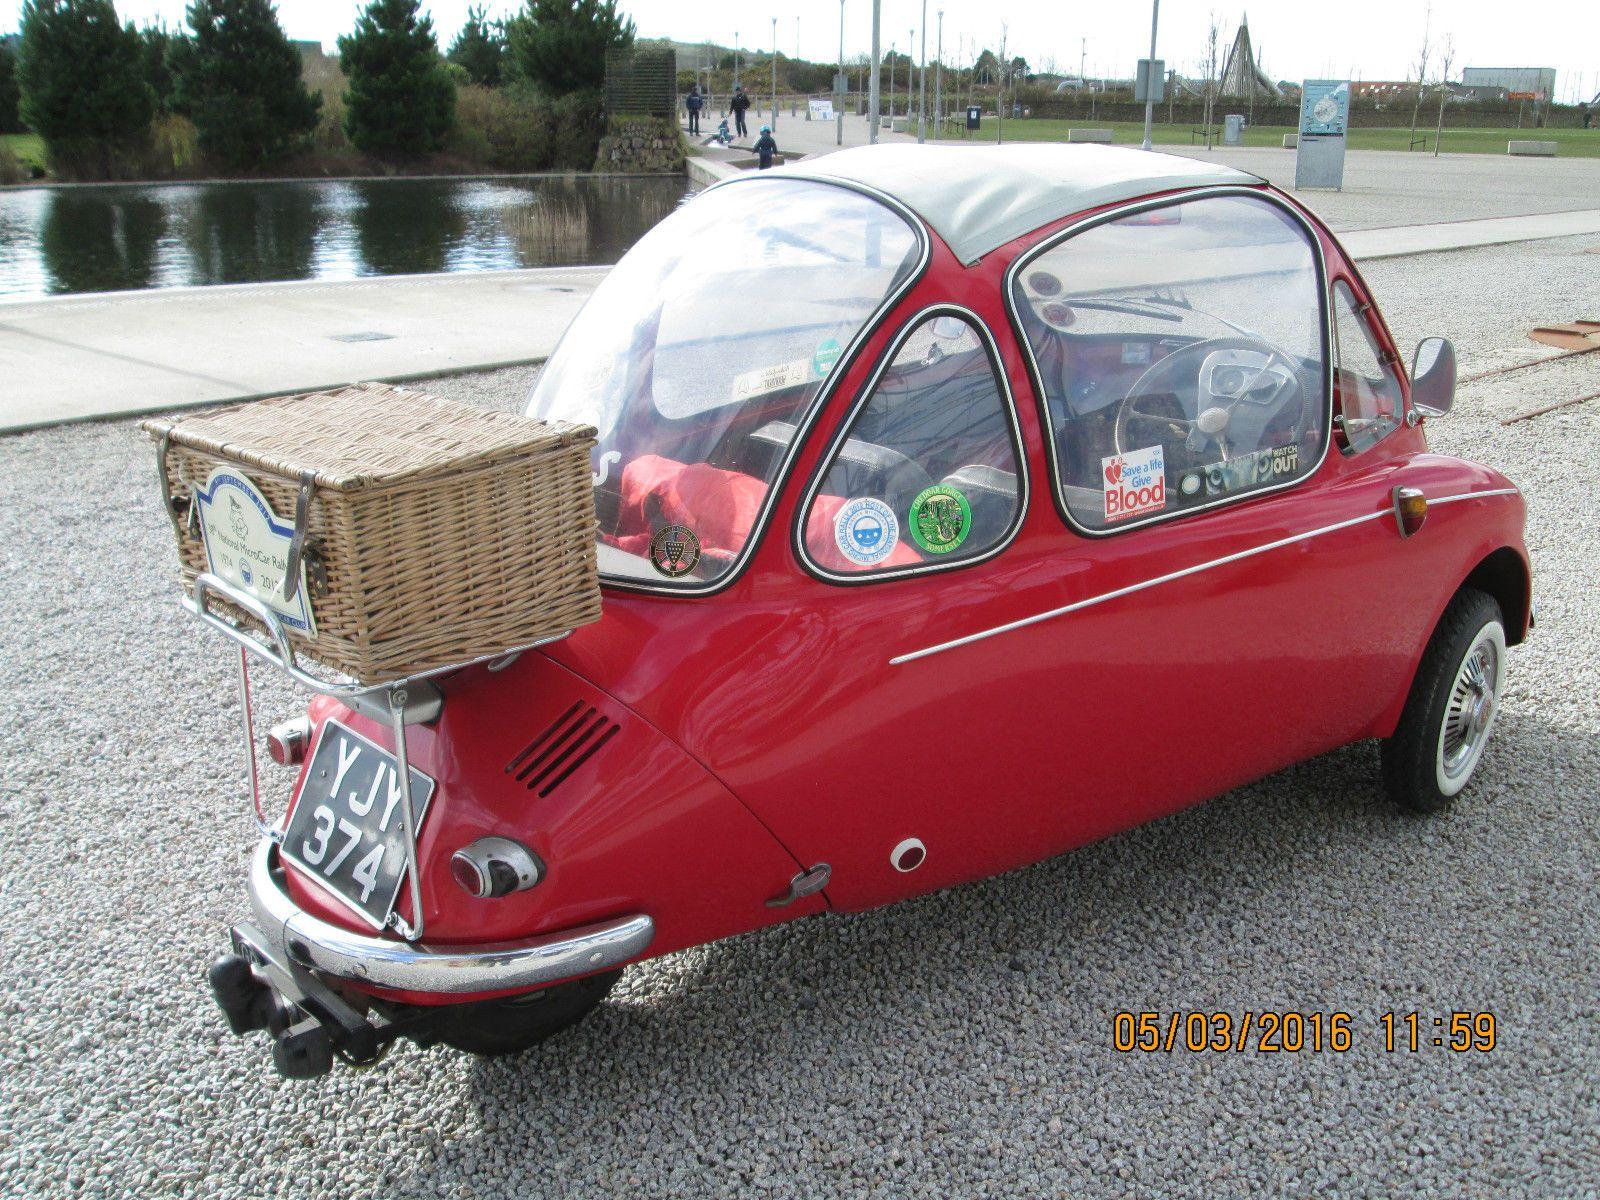 Heinkel trojan bubble car 1963 | Vehicle and Cars